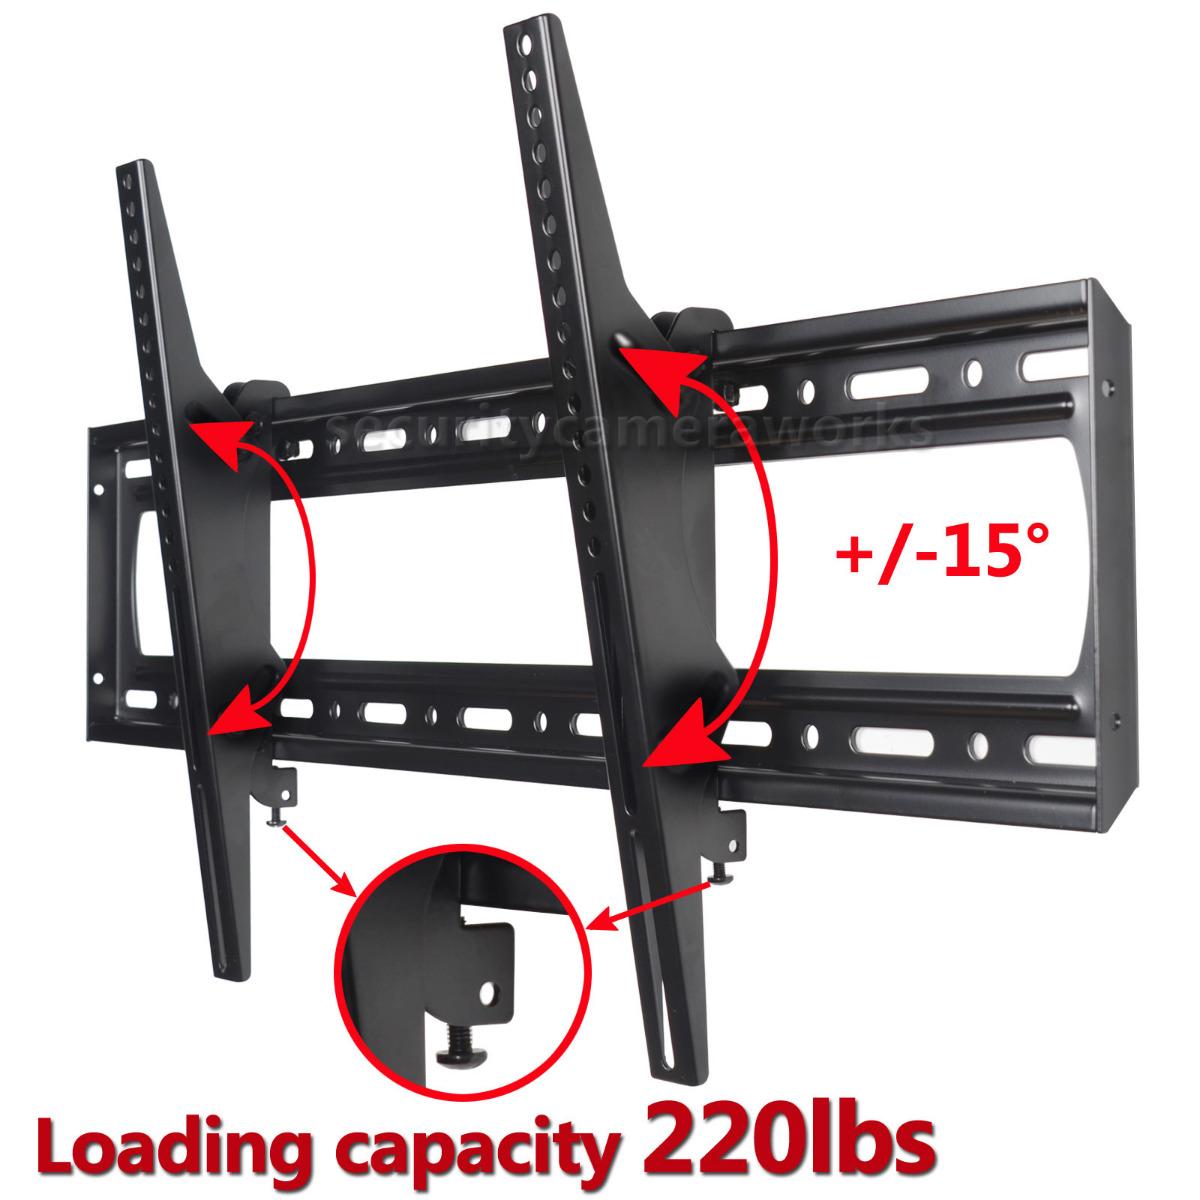 4914e661affa Details about Tilt LCD LED Plasma TV Wall Mount for Samsung LG Sharp Seiki  Vizio RCA 60-85 C06